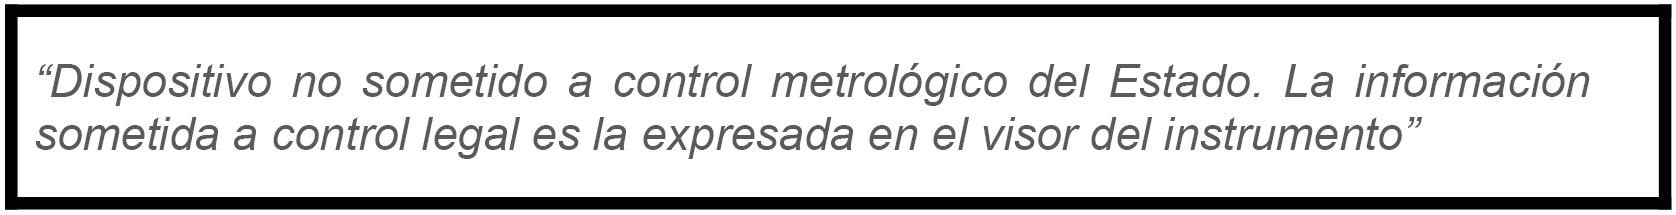 BOE.es - Documento BOE-A-2016-5530